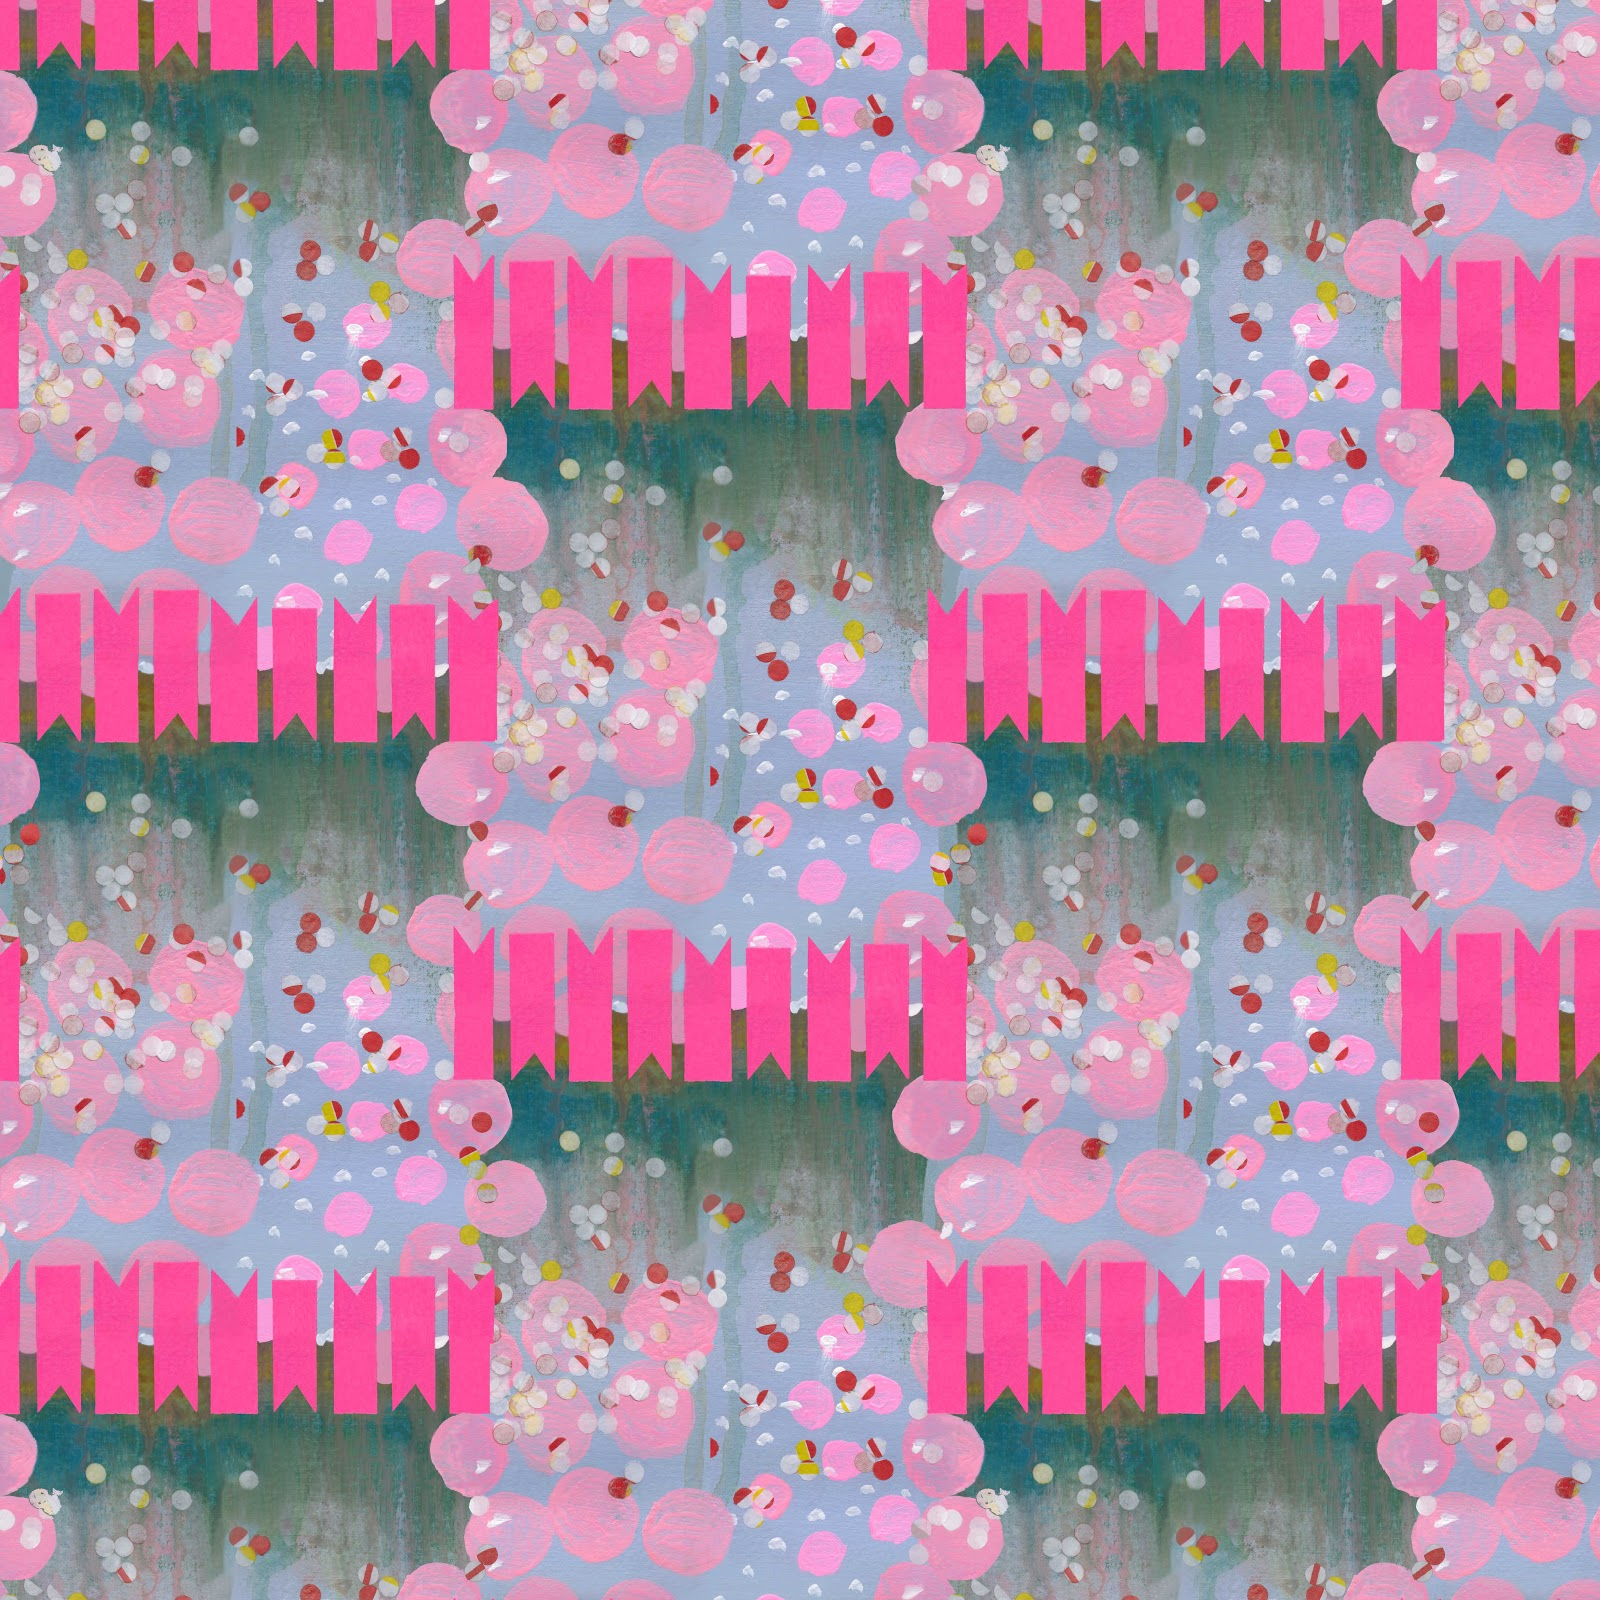 Deigning April Louise Sharman Abstract Half Drop Repeats